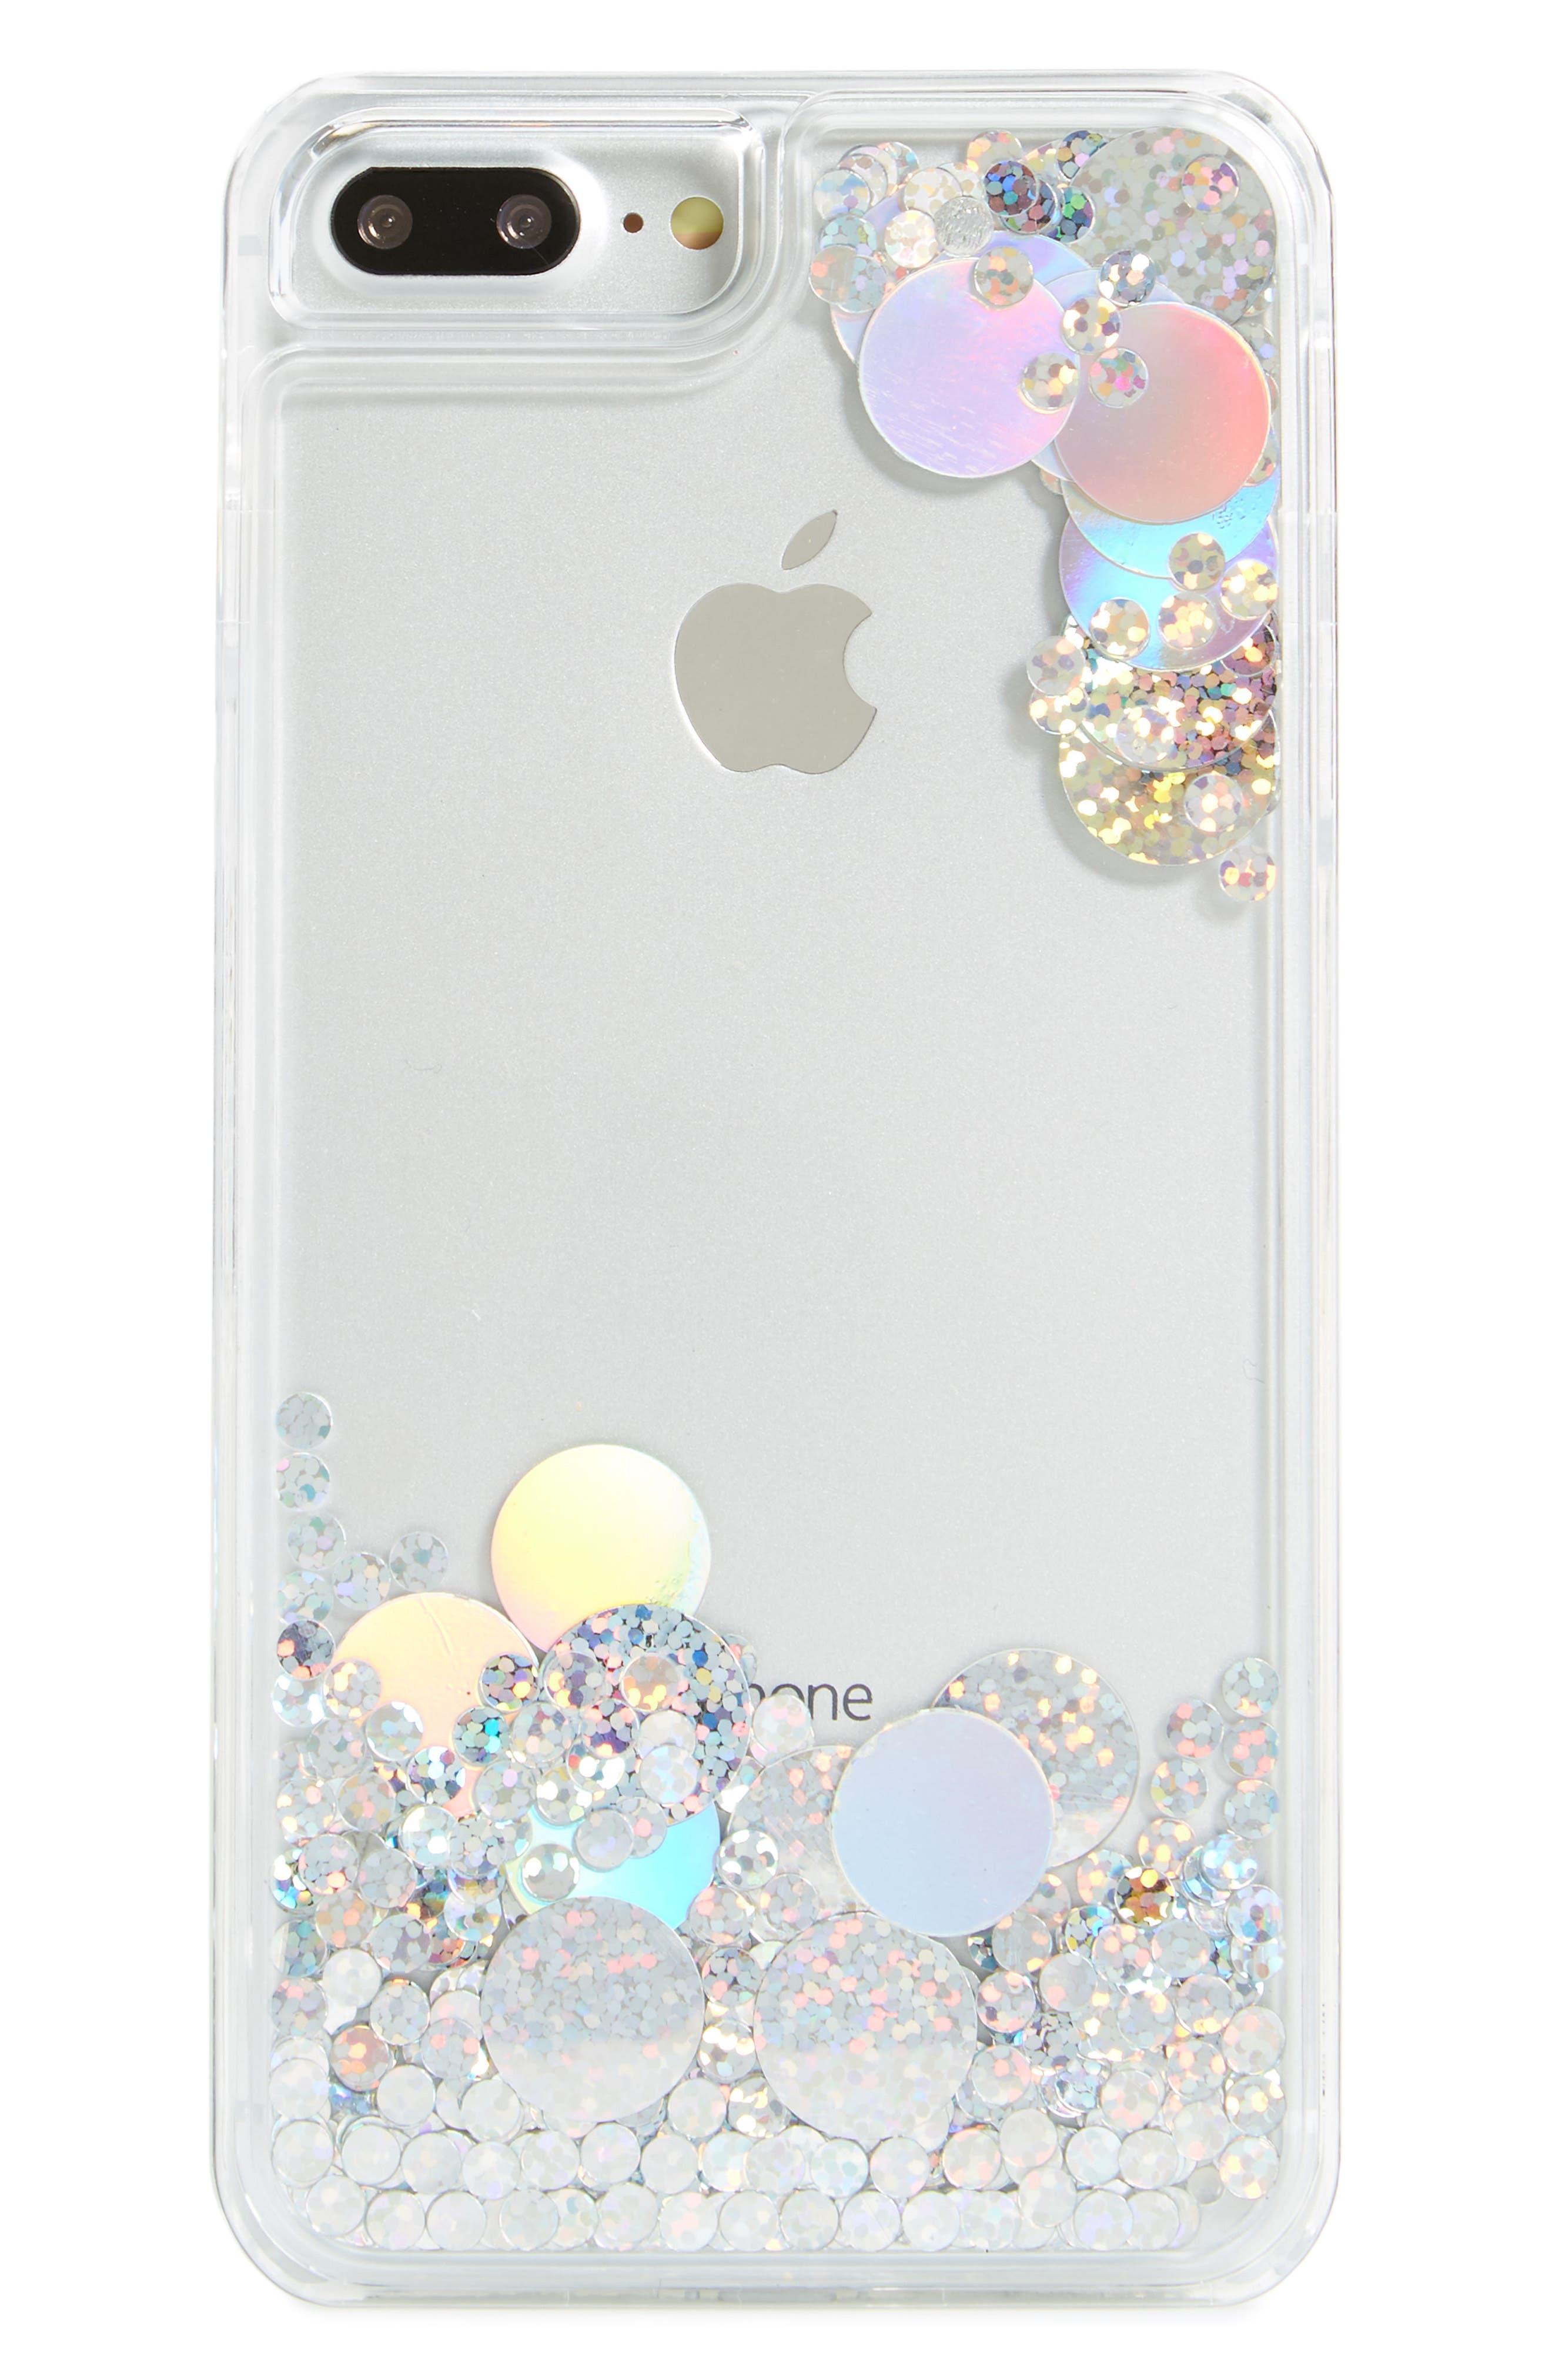 Skinnydip Holo Circle Jelly iPhone 6/7 & 6/7 Plus